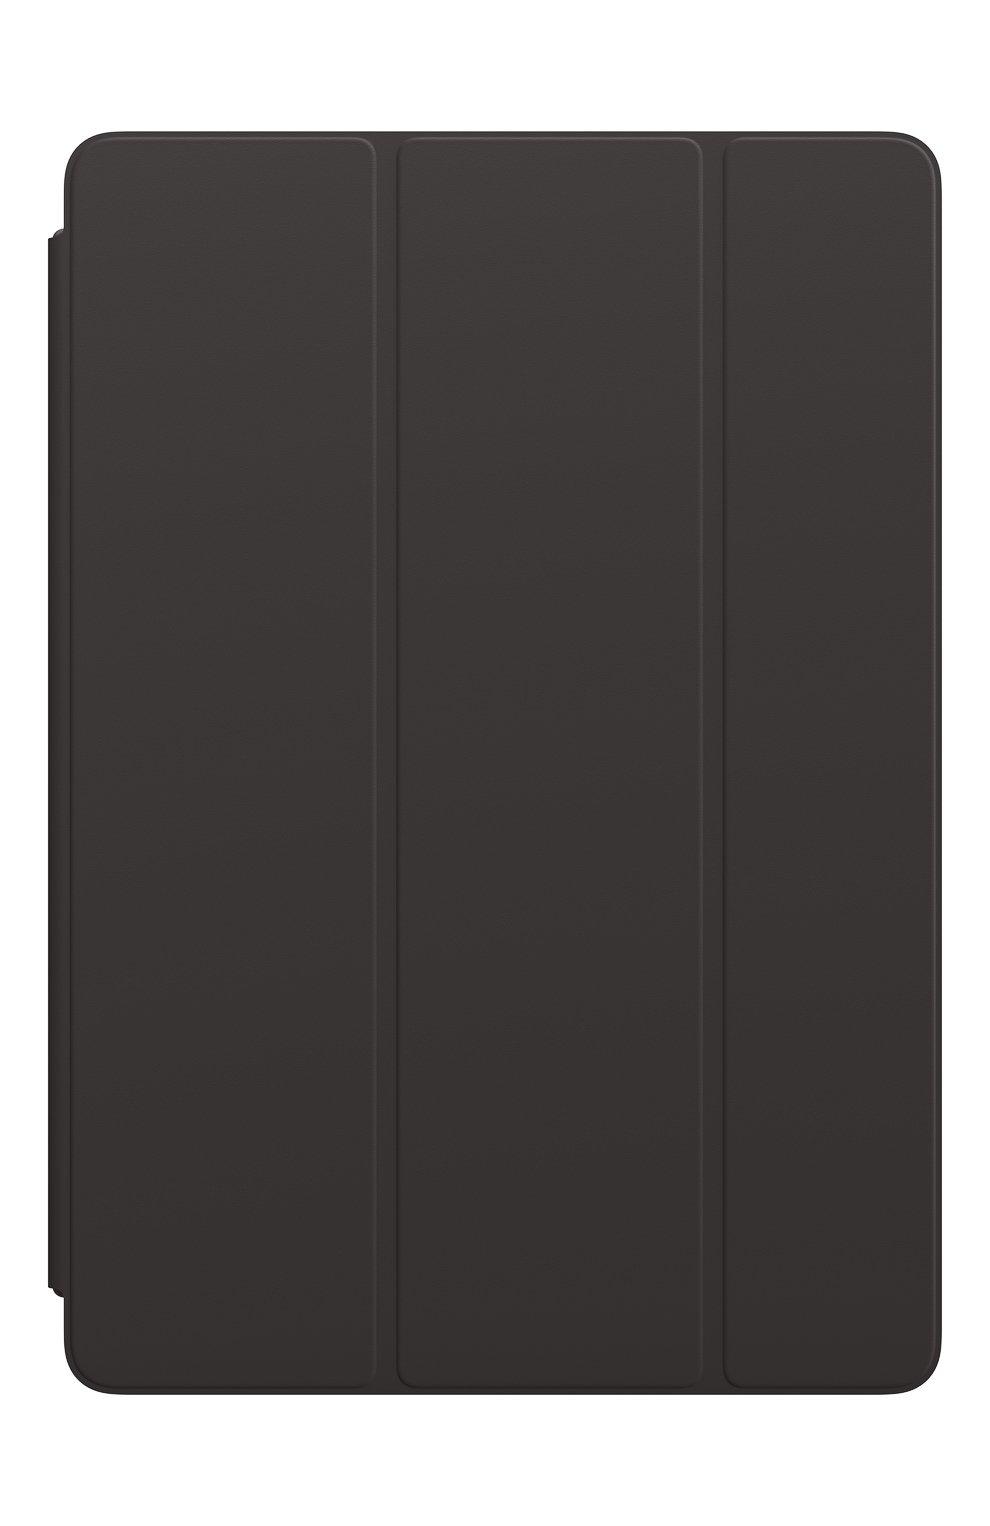 Чехол smart cover для ipad (7th gen)/ipad air (3rd gen) APPLE  черного цвета, арт. MX4U2ZM/A | Фото 1